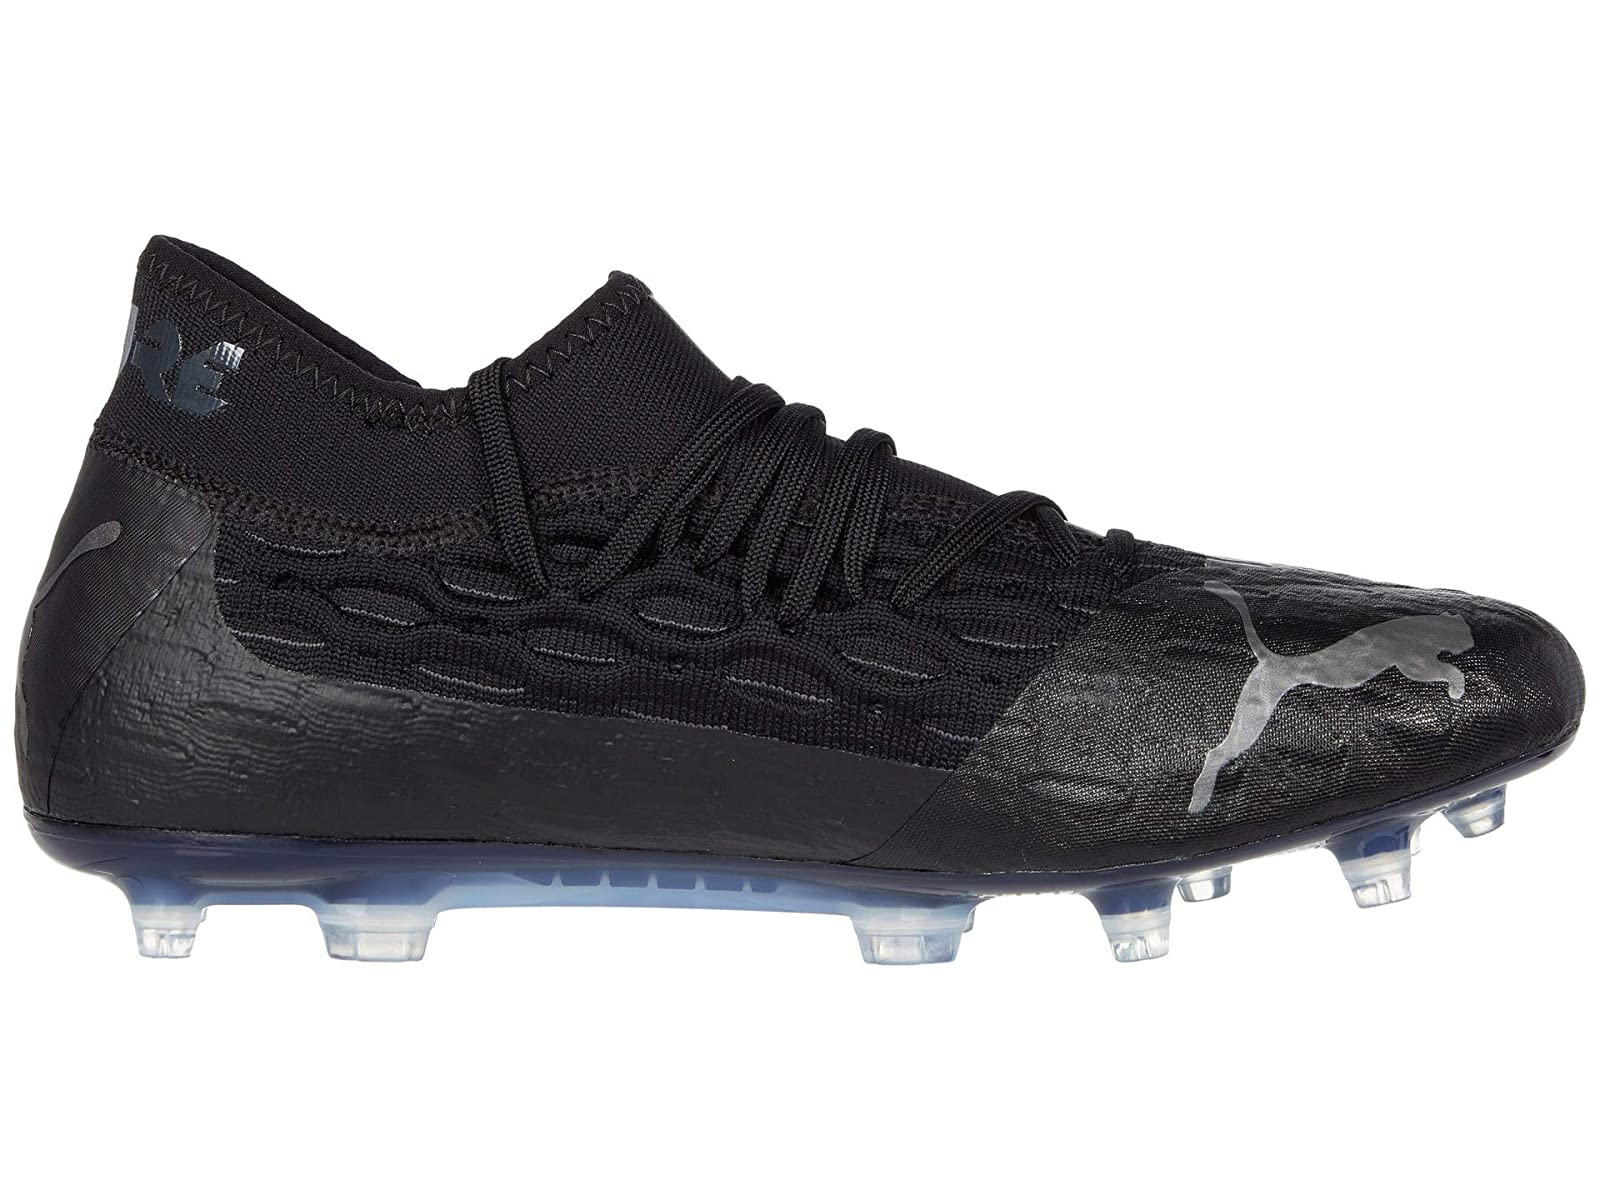 Man-039-s-Sneakers-amp-Athletic-Shoes-PUMA-Future-5-2-Netfit-FG-AG thumbnail 14